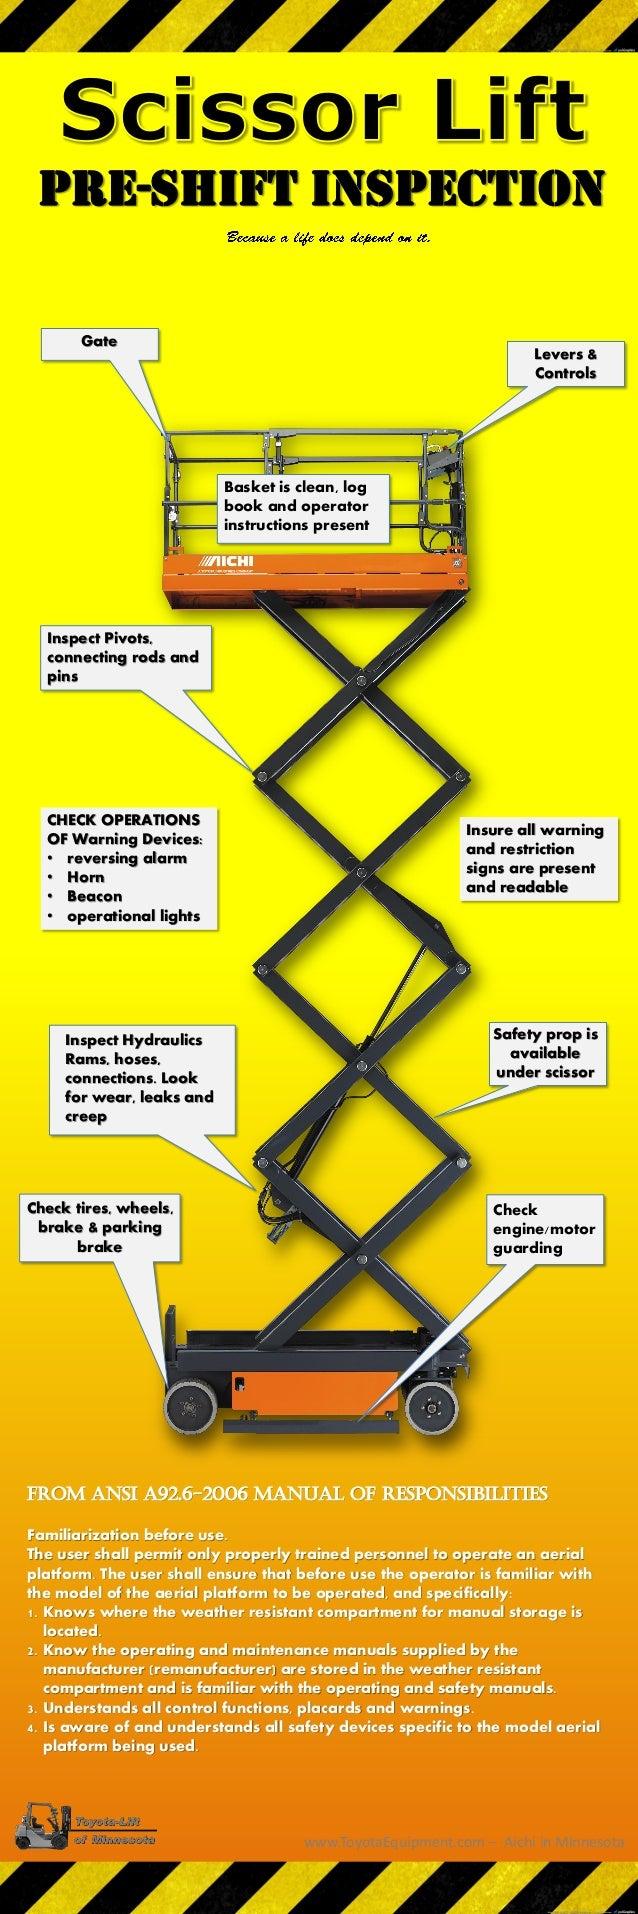 Scissor Lift Pre Shift Inspection